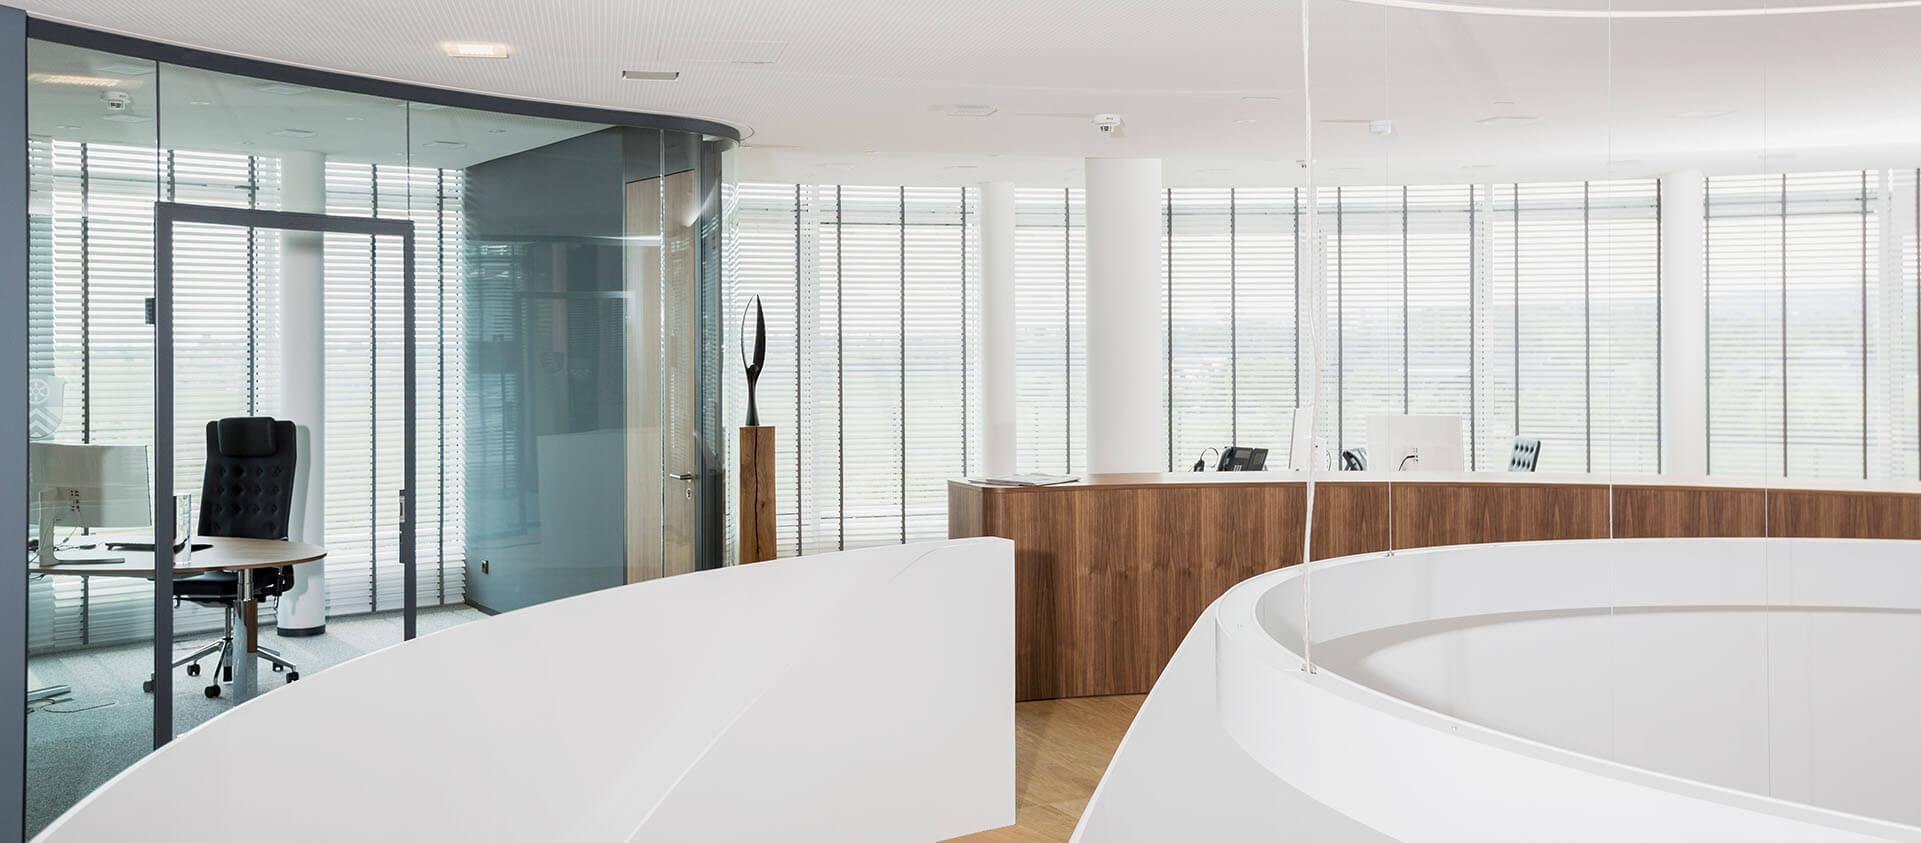 Bürogebäude geplant von Florian + Eberhard Horn, Empfang